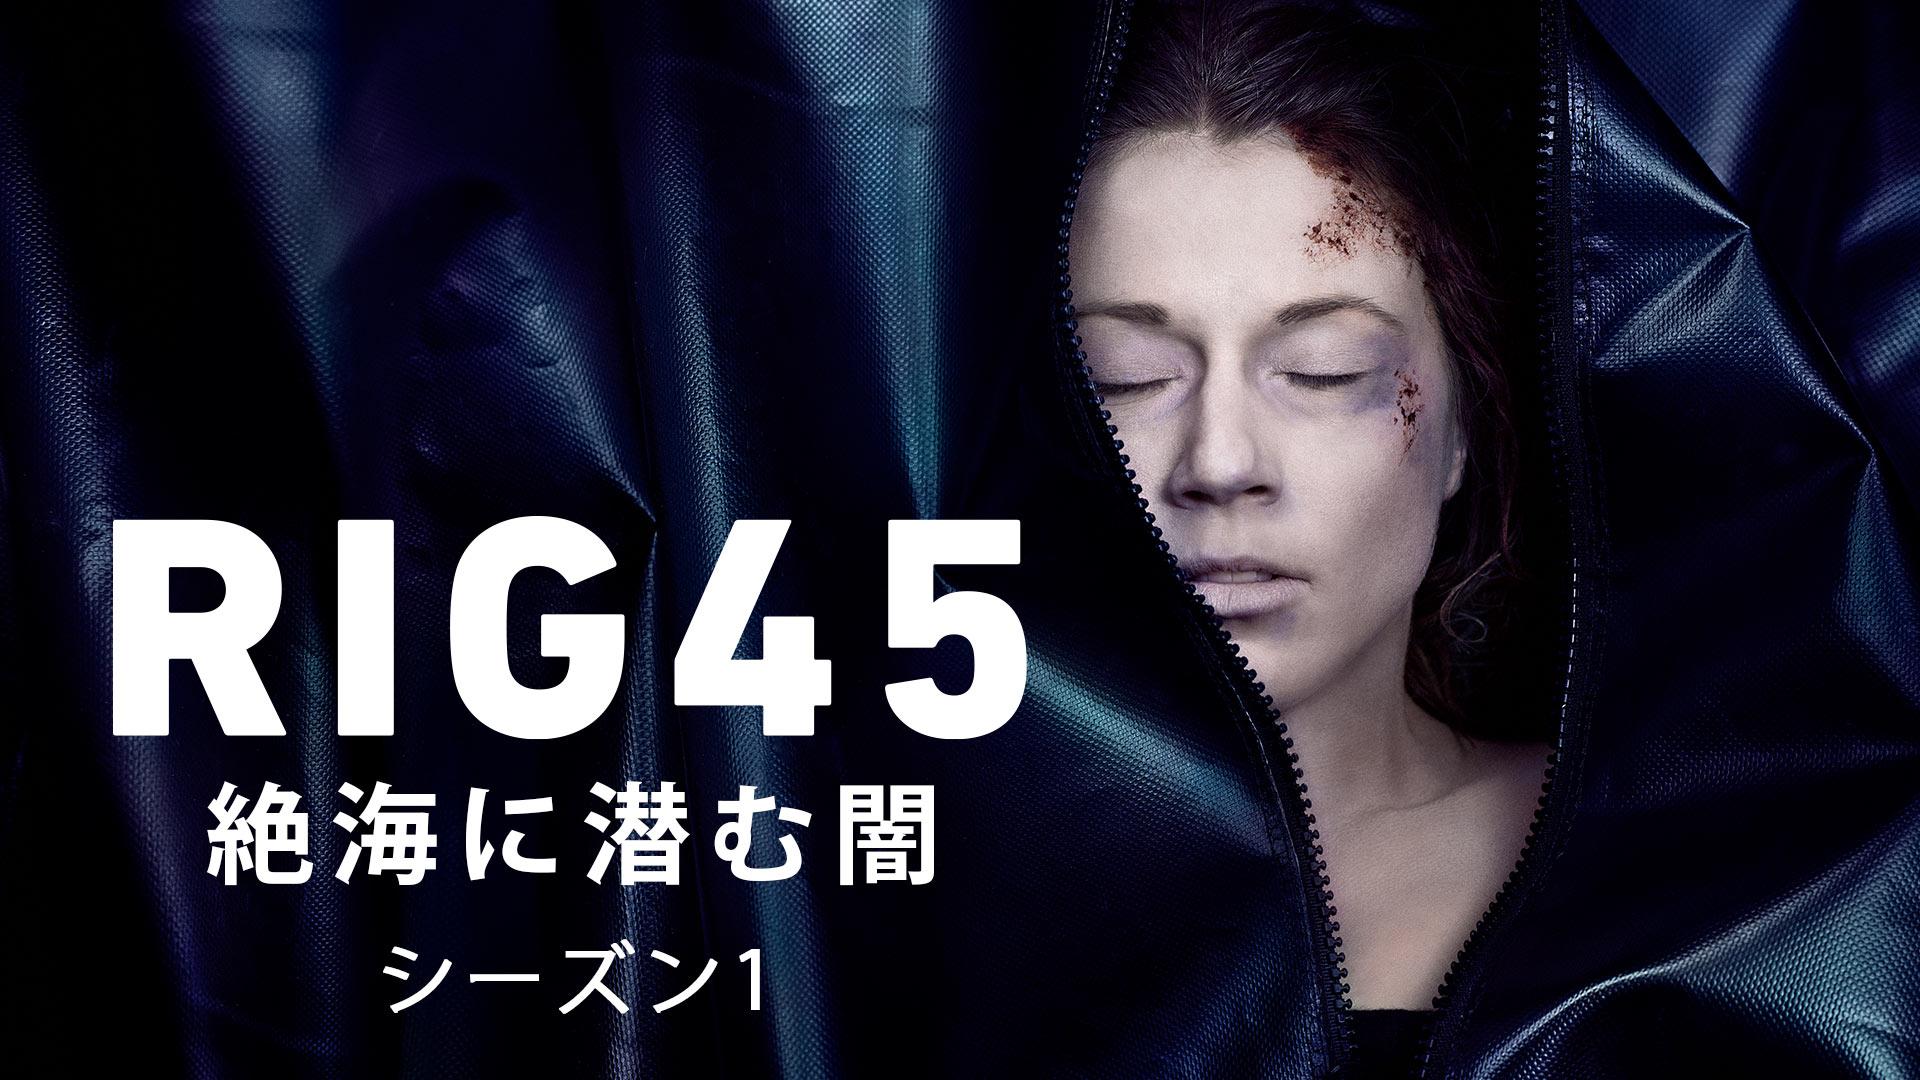 RIG45  絶海に潜む闇 シーズン1